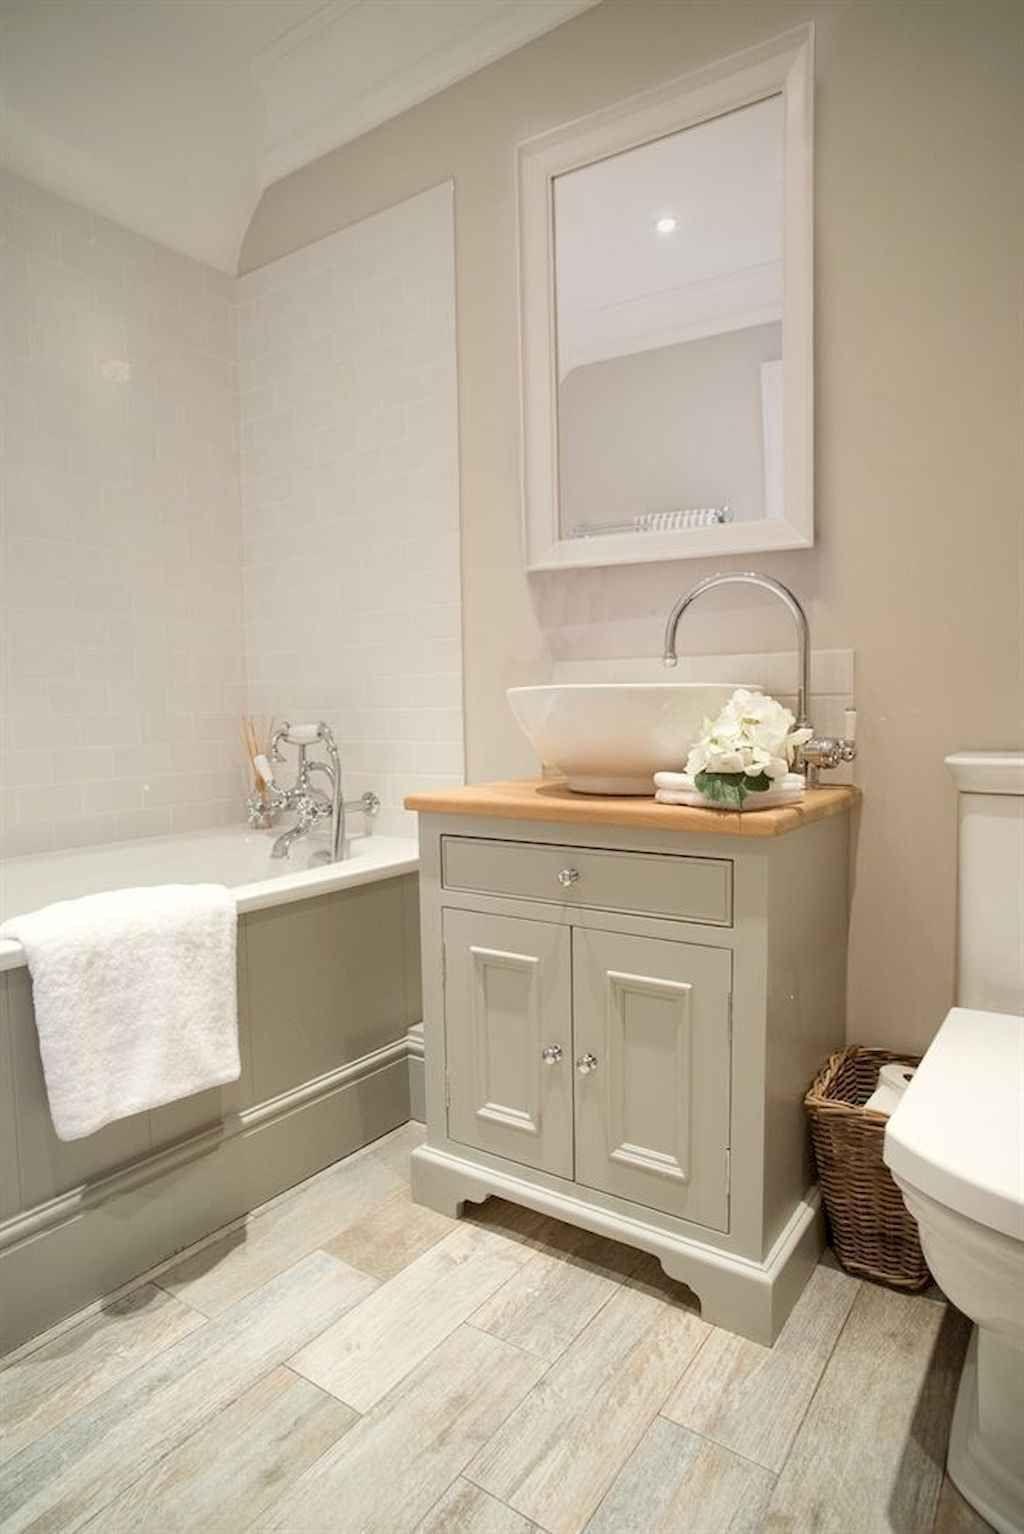 80 cool small bathroom remodel ideas small bathroom on cool small bathroom design ideas id=80152